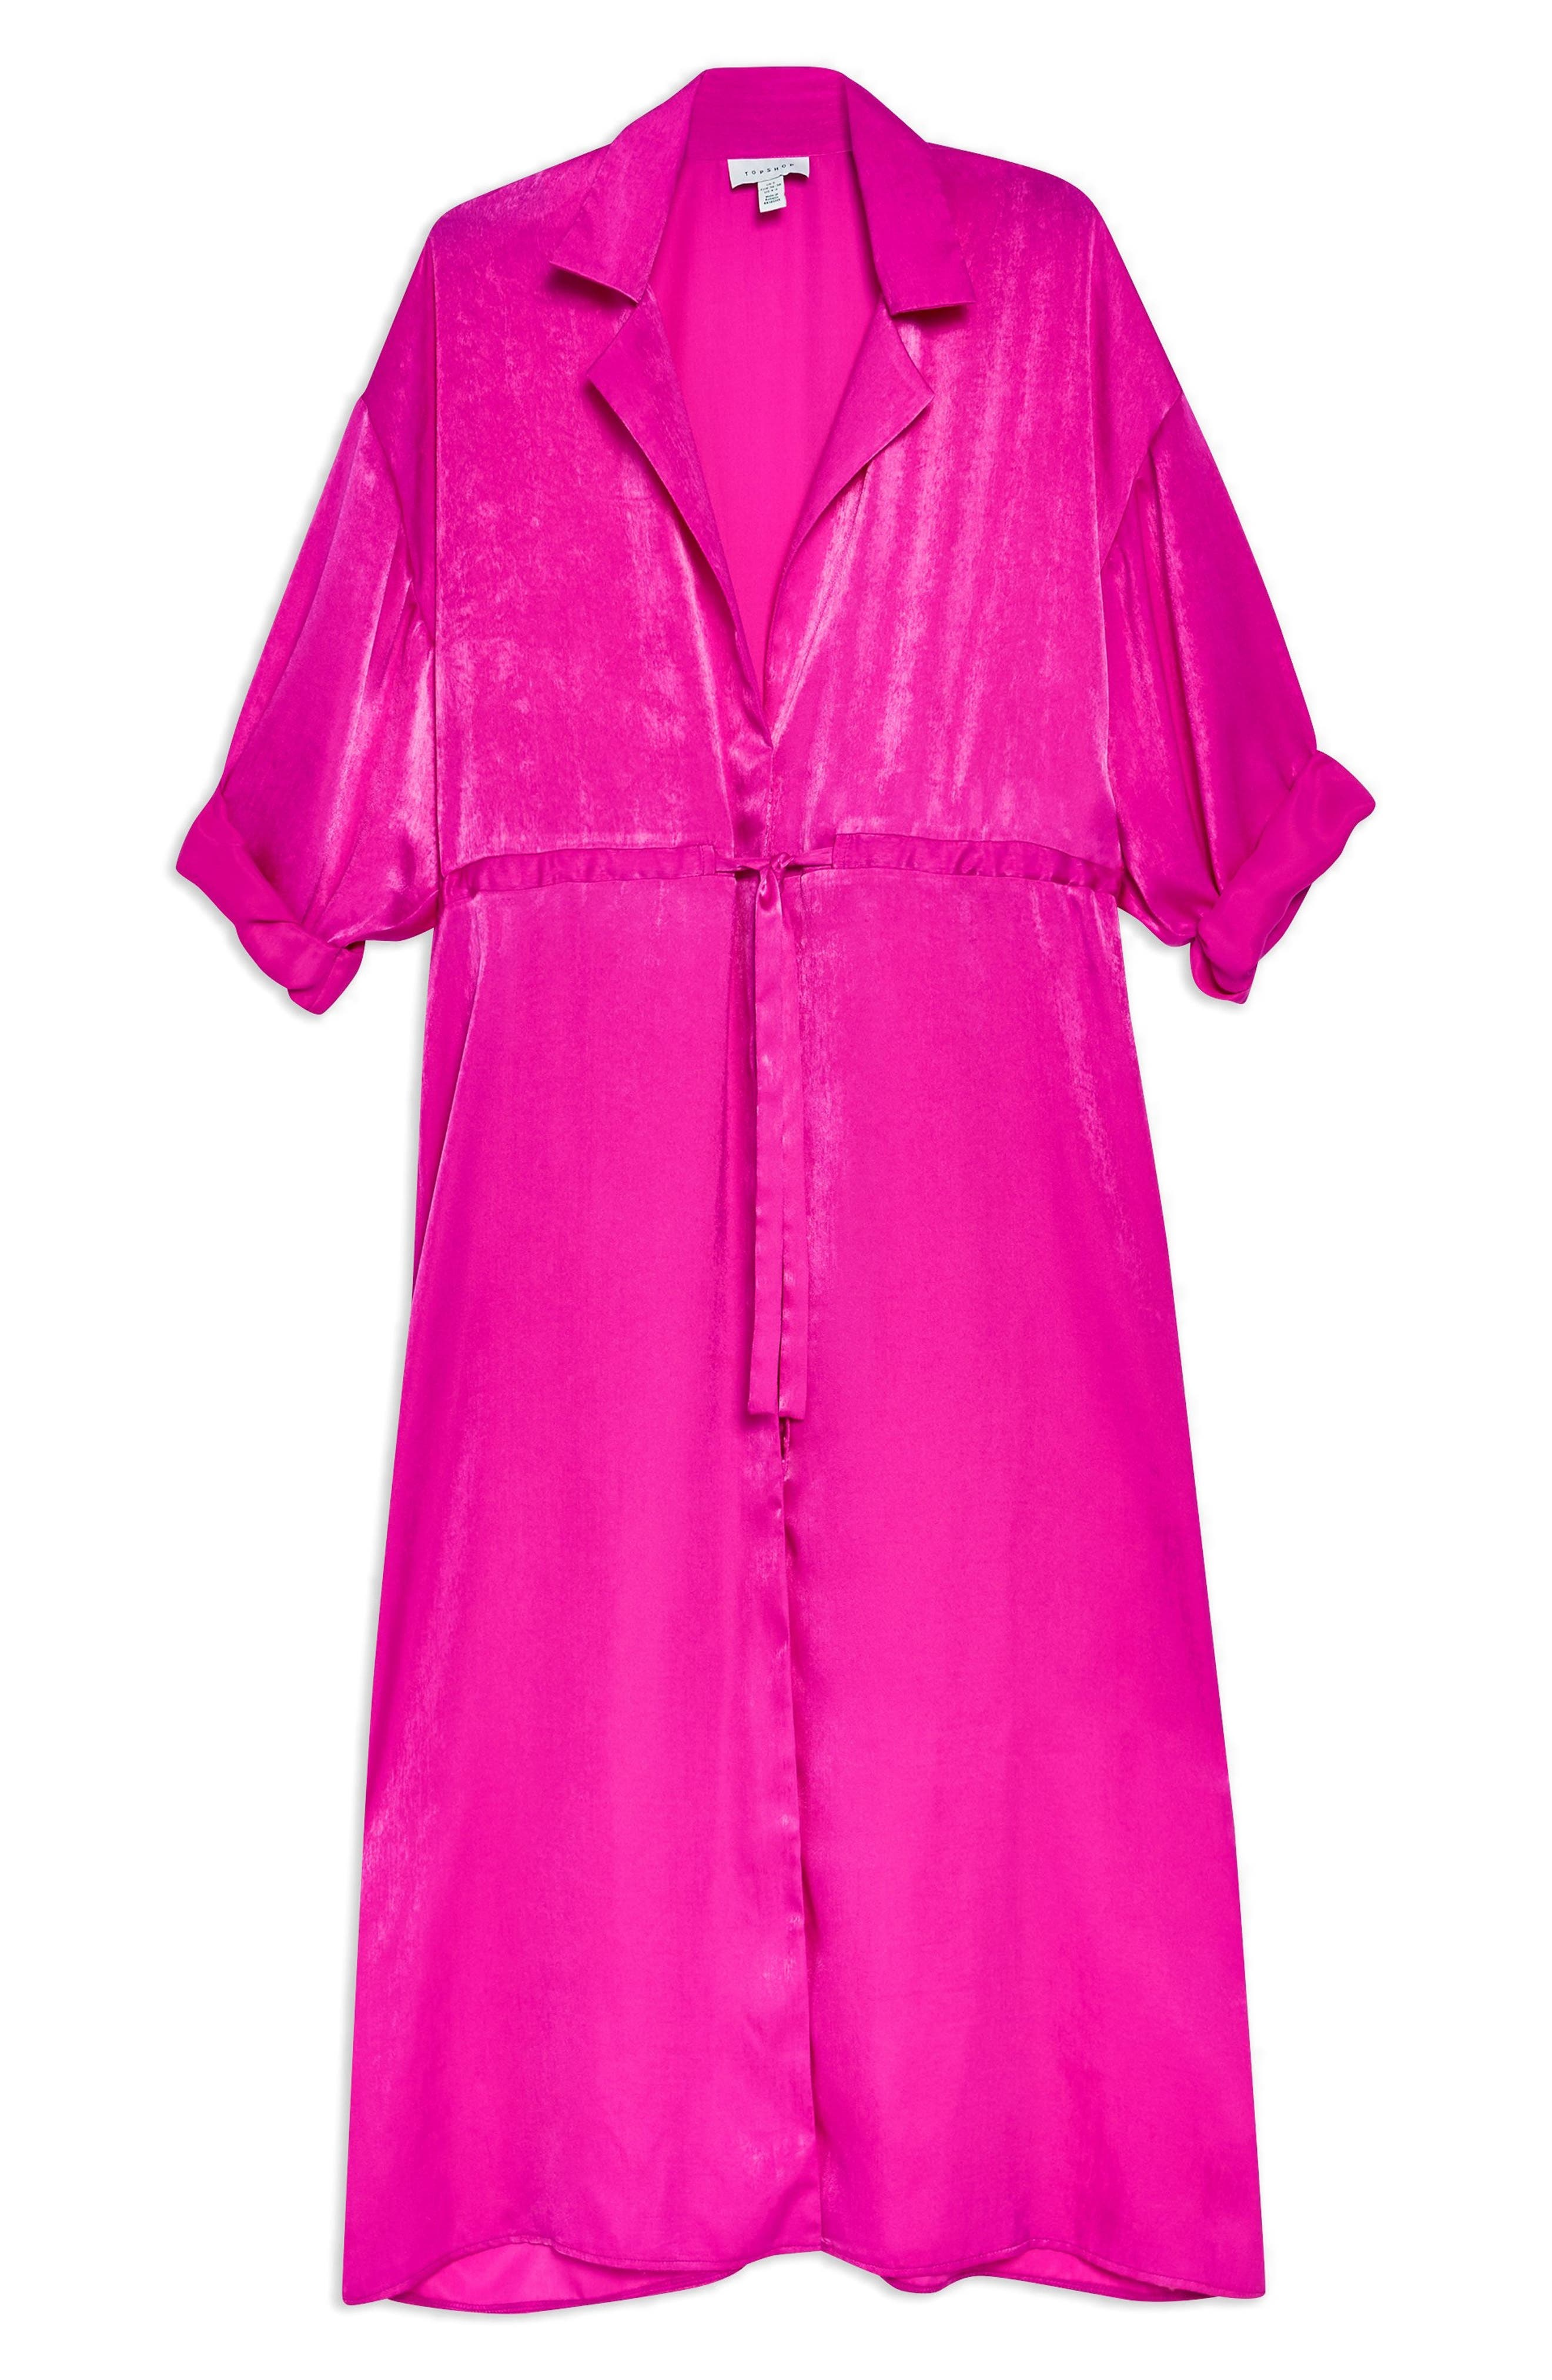 TOPSHOP,                             Satin Midi Shirtdress,                             Alternate thumbnail 3, color,                             BRIGHT PINK